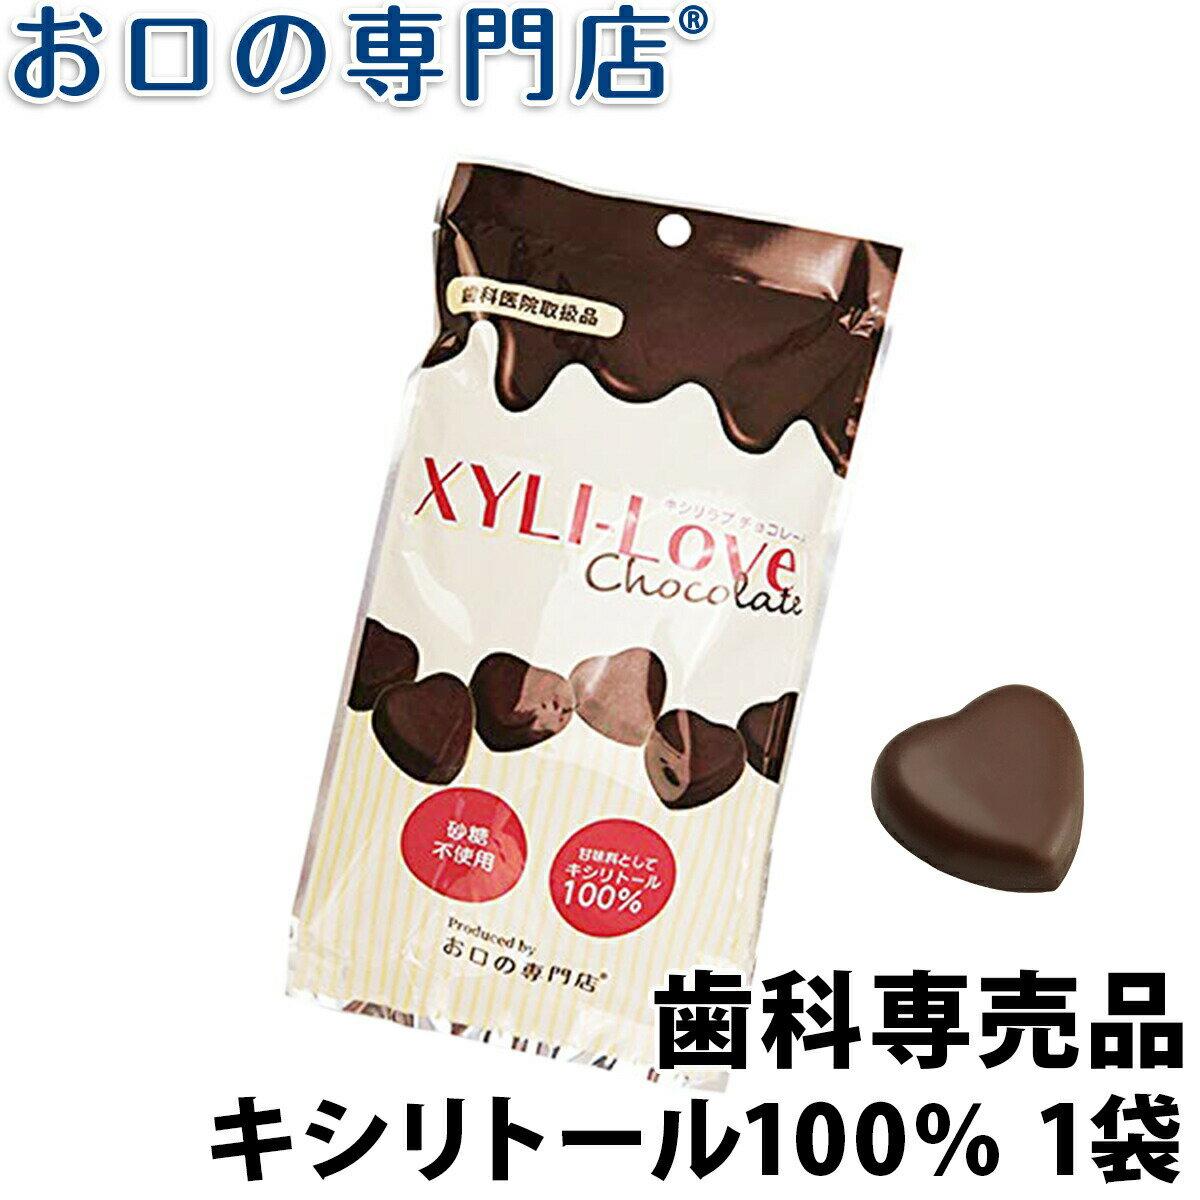 XYLI-LOVE(キシリラブ) チョコレート 24粒(72g) × 1袋 【ゆうパケット(メール便)OK】